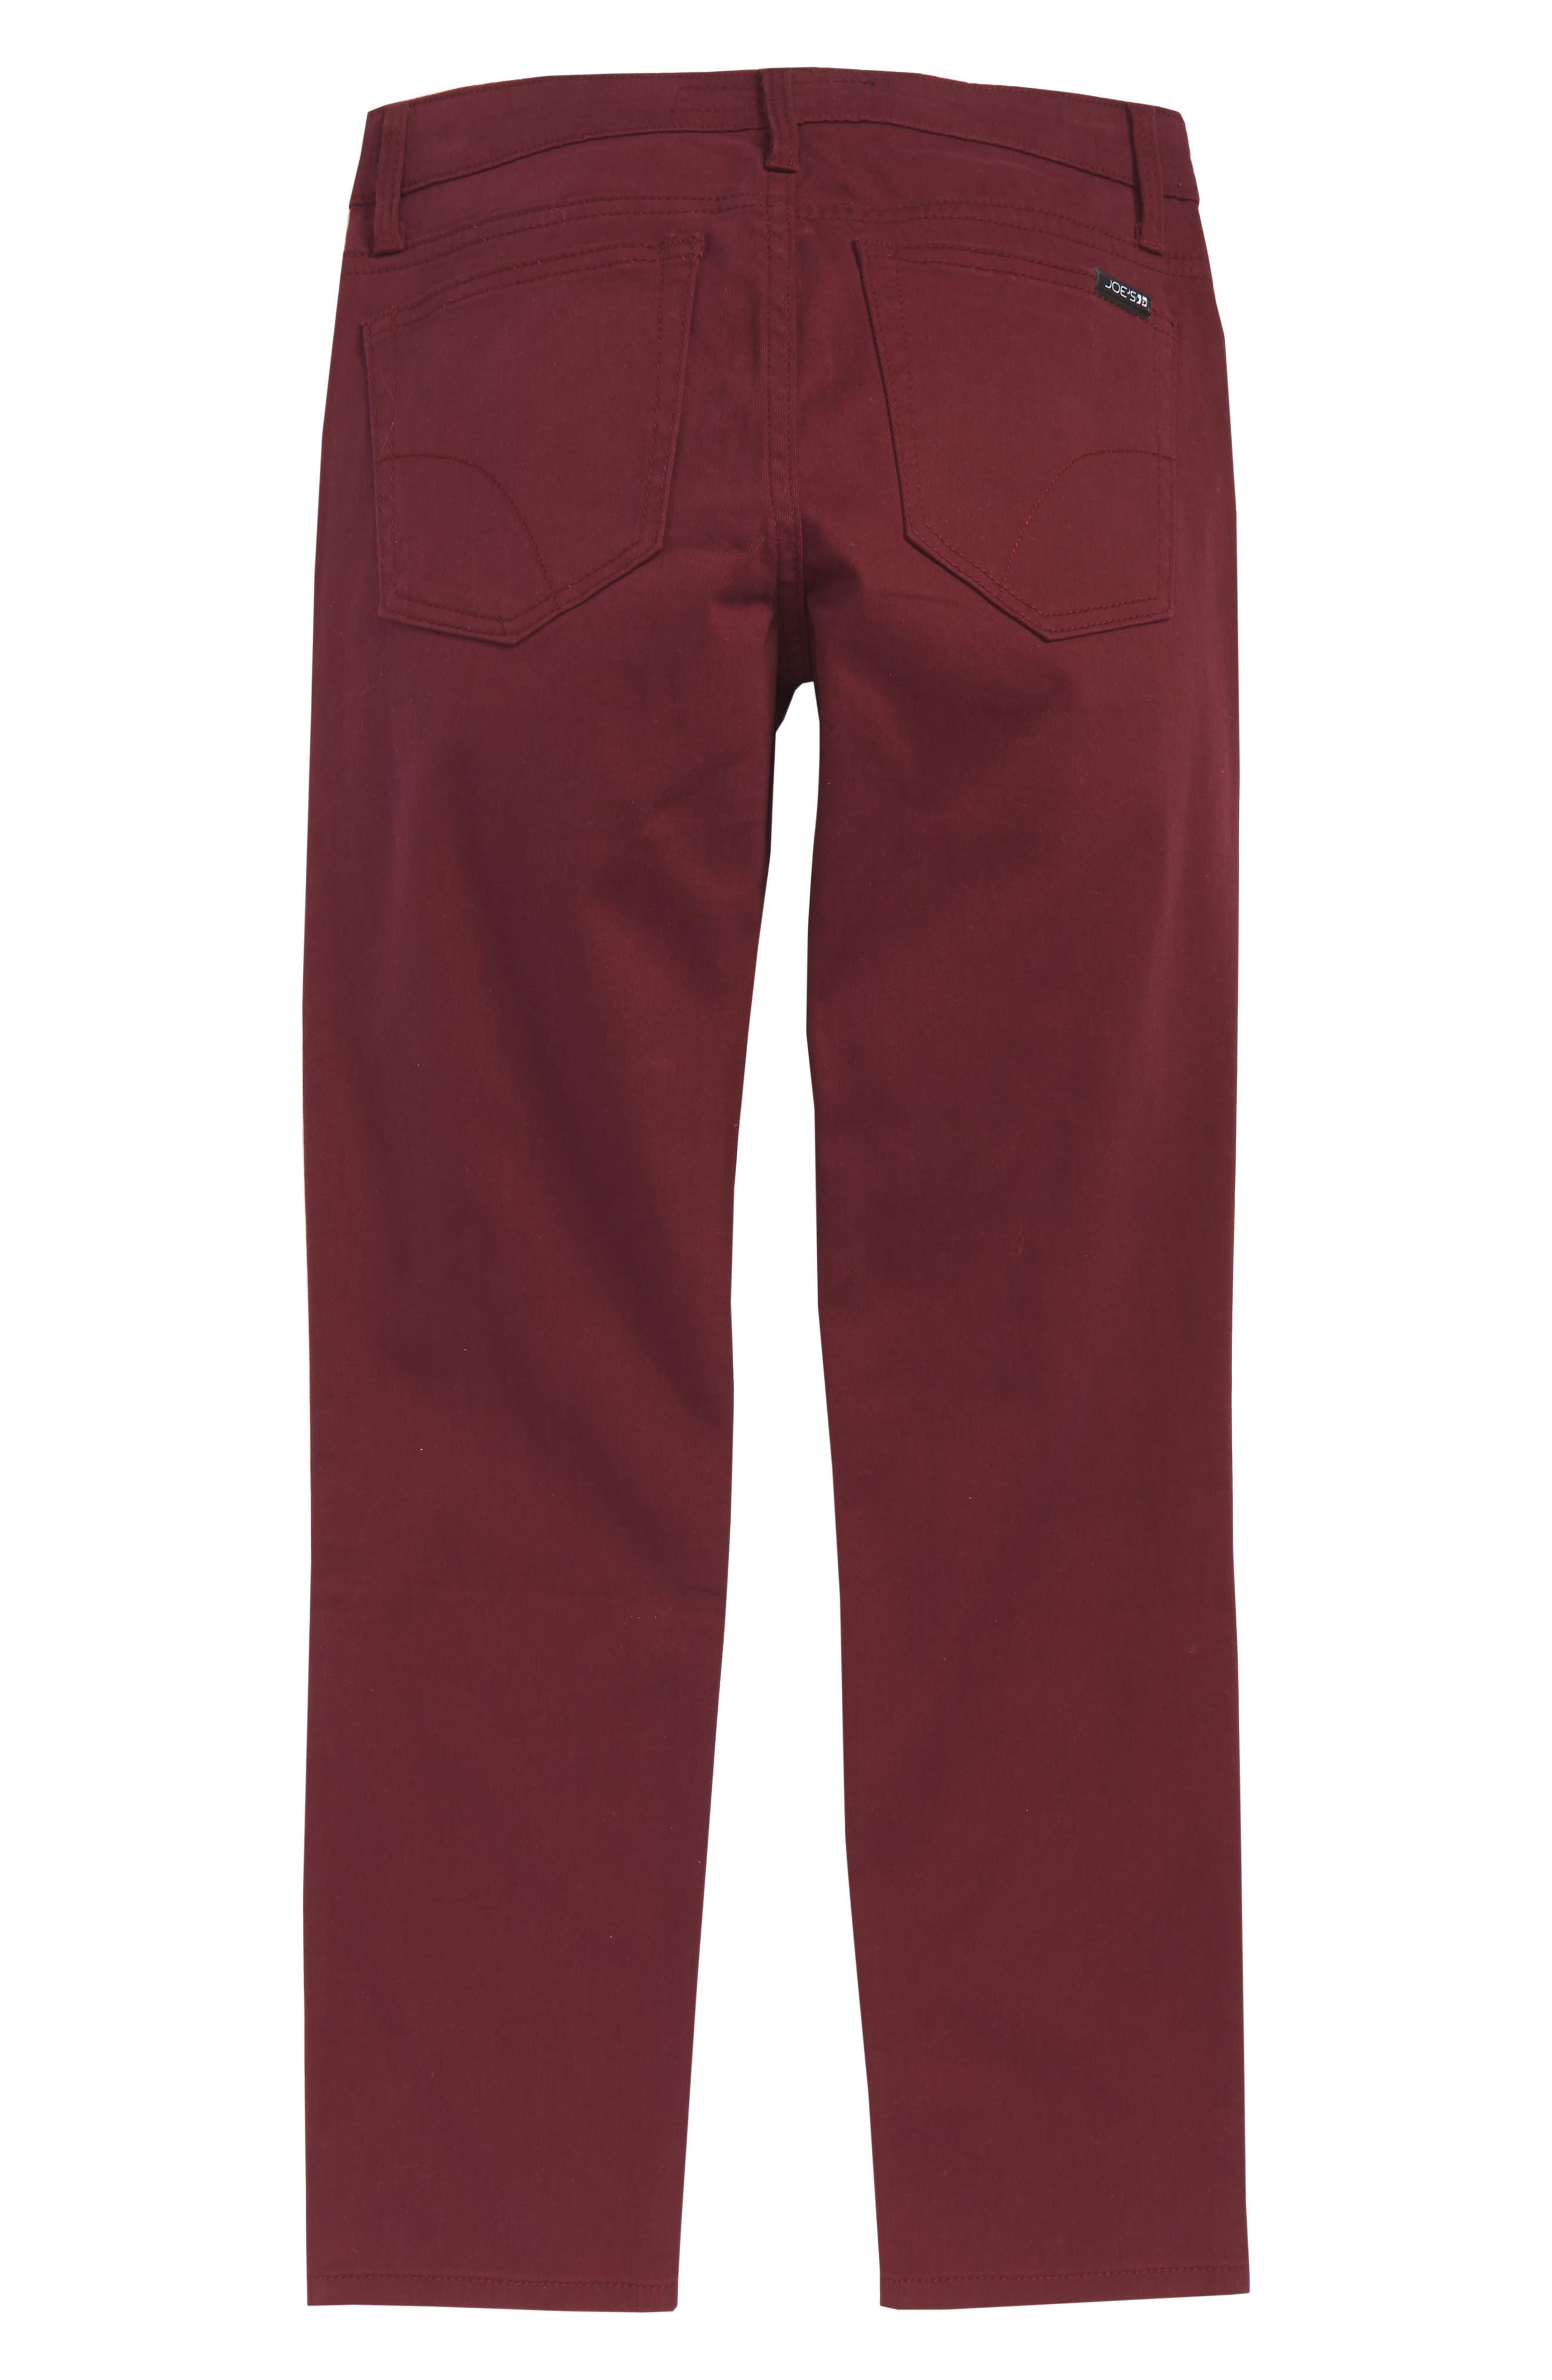 Brixton Straight Leg Stretch Twill Pants,                             Alternate thumbnail 2, color,                             WINE